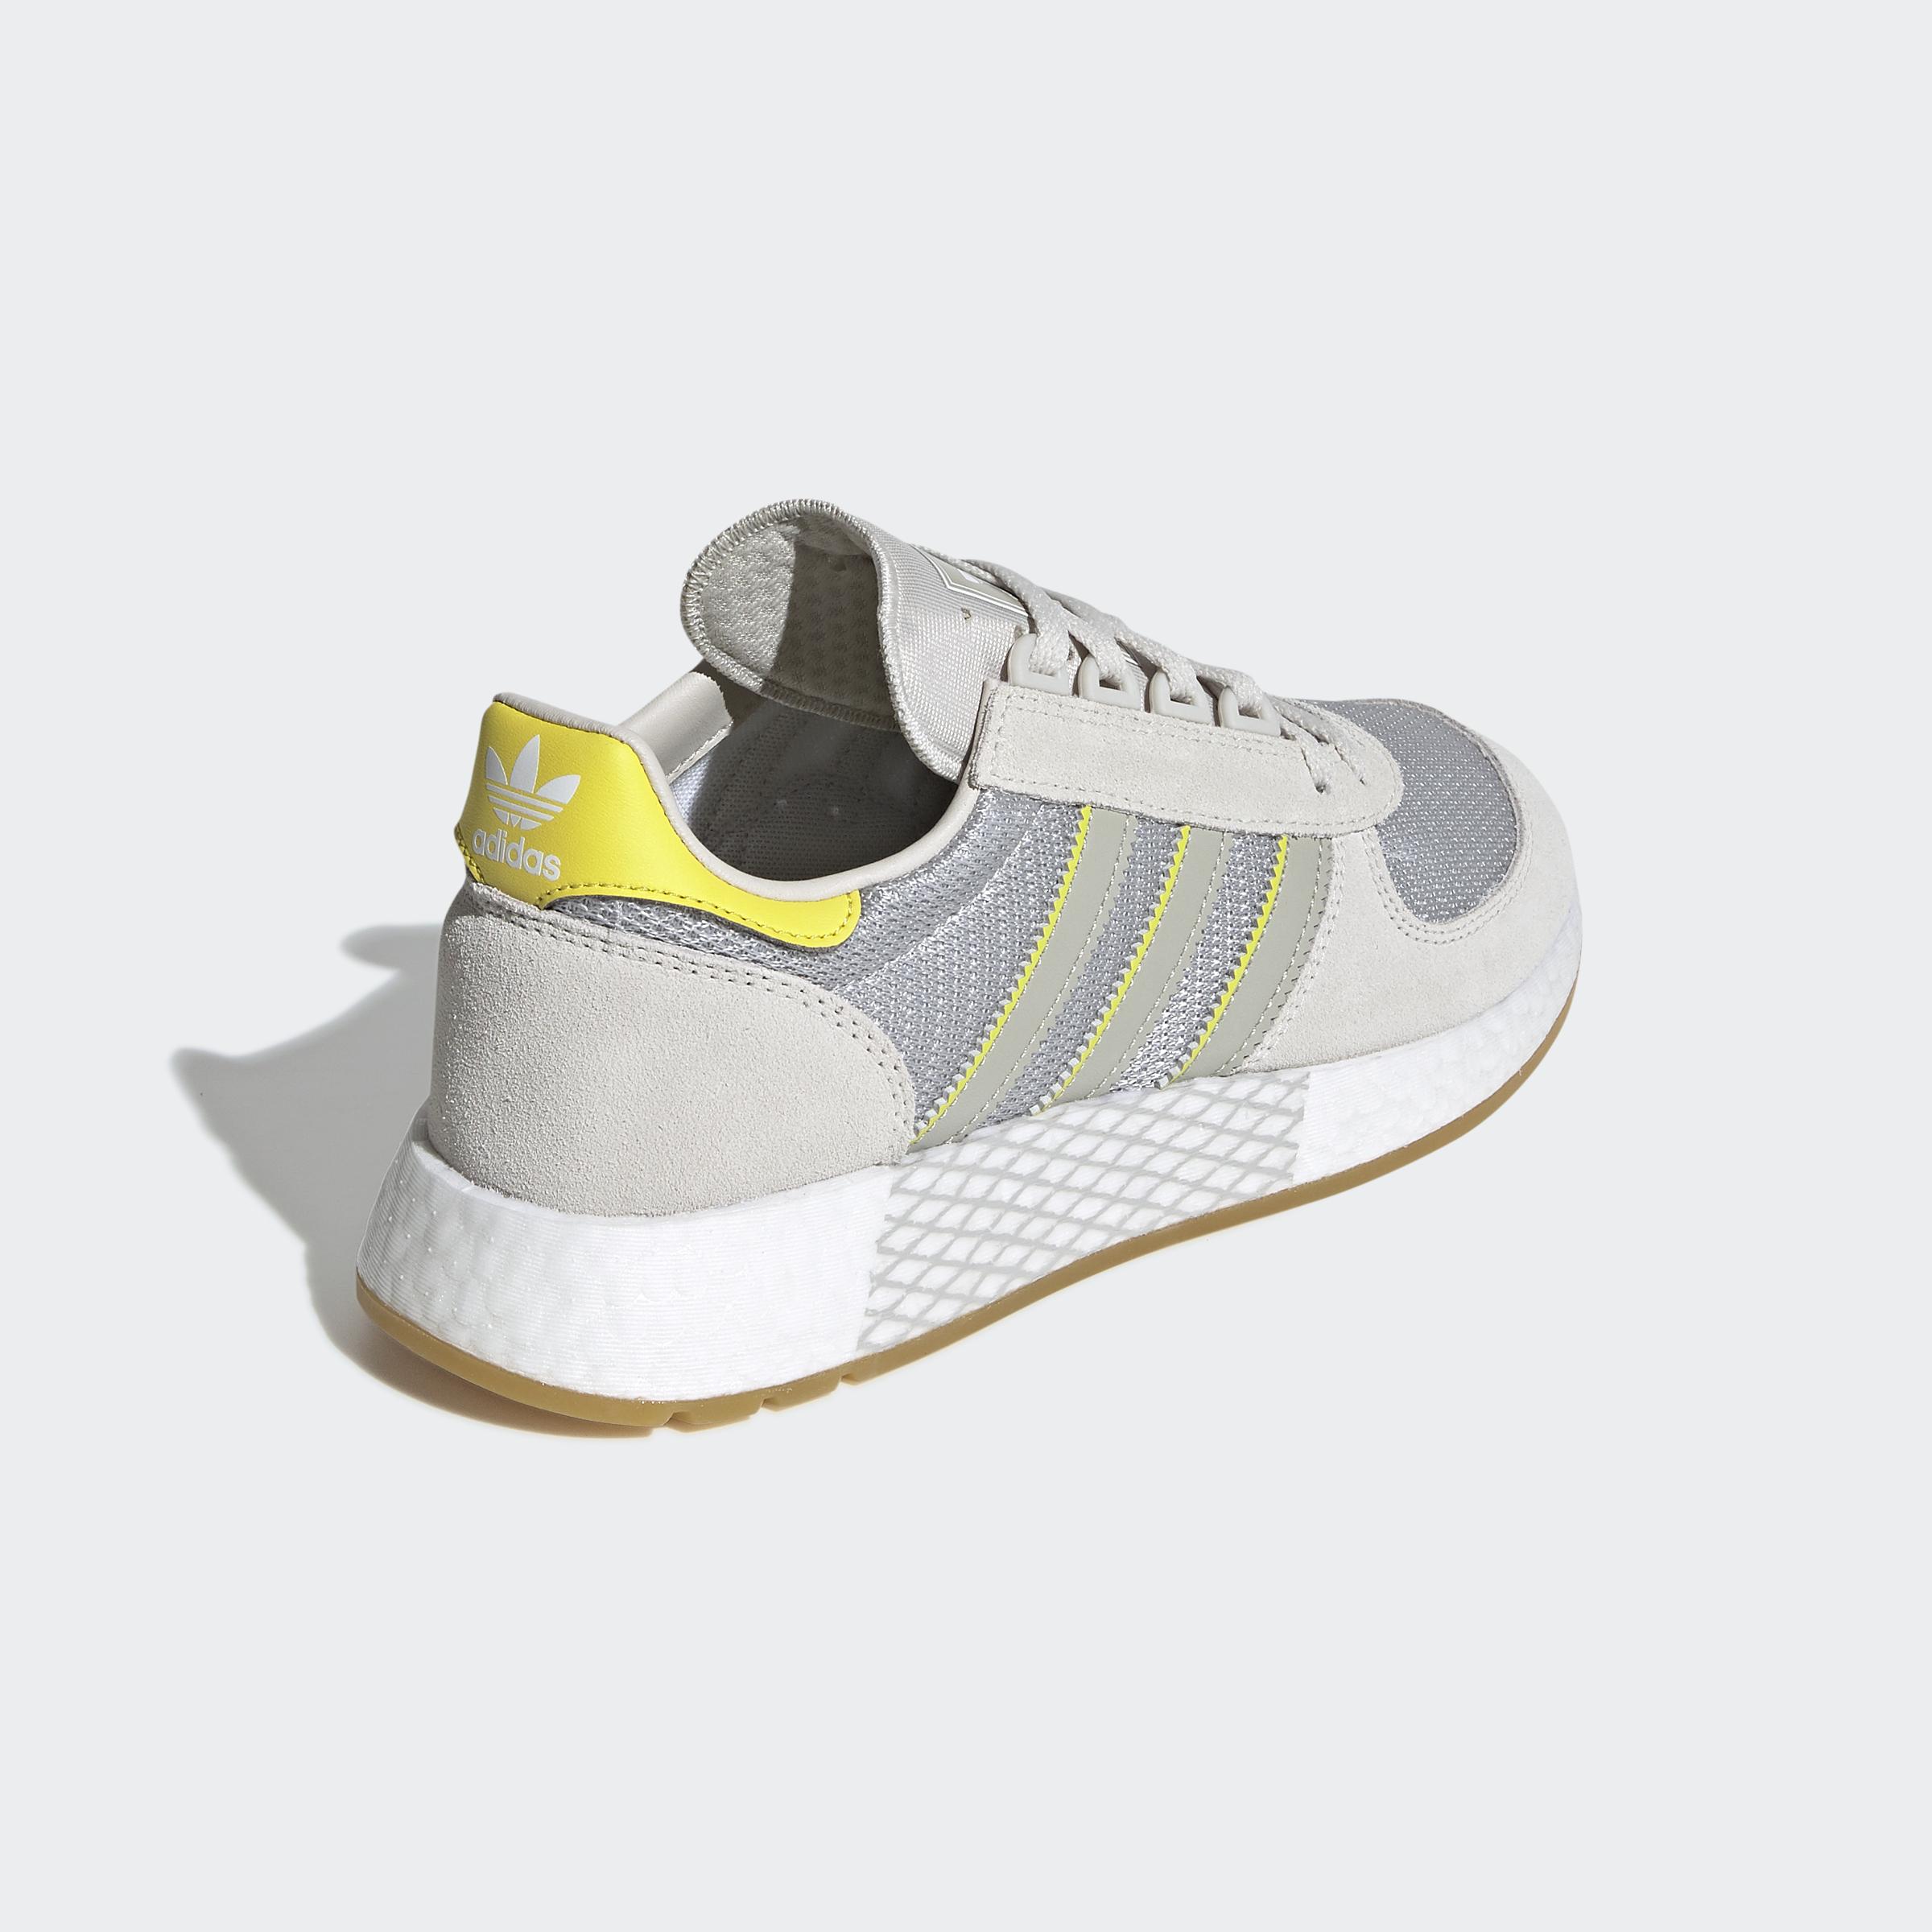 adidas-Marathon-Tech-Shoes-Women-039-s-Athletic-amp-Sneakers thumbnail 11